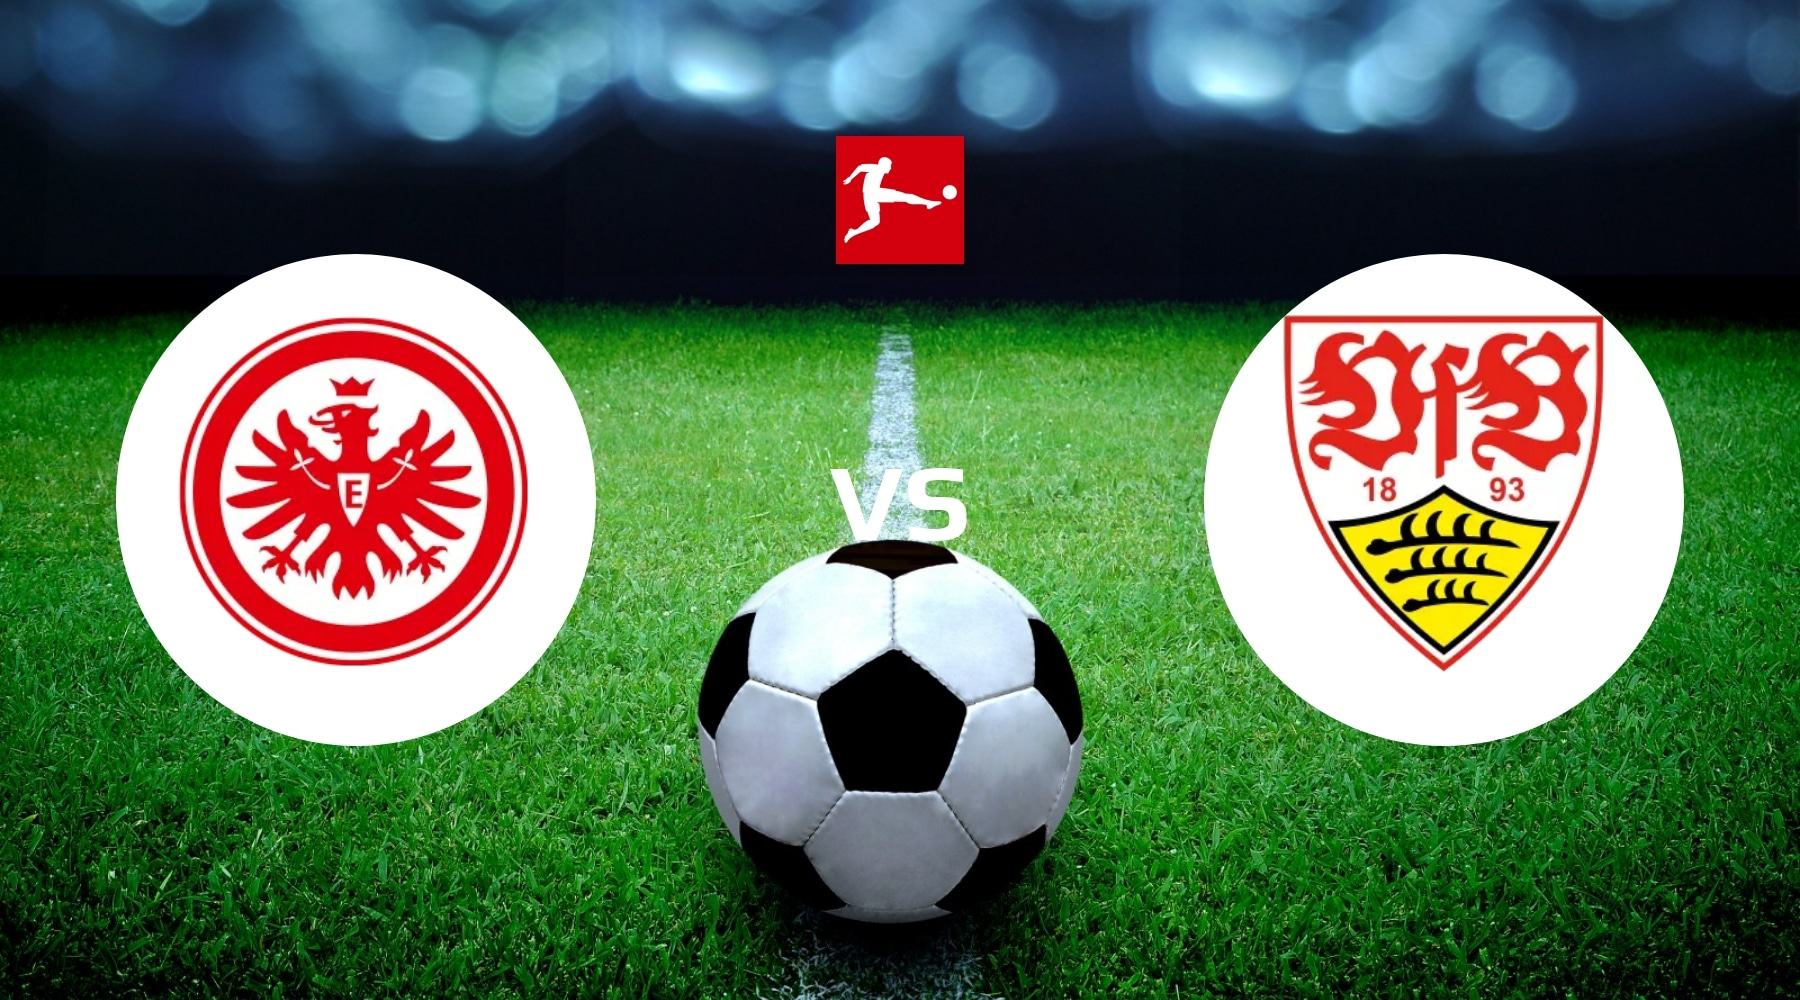 Eintracht vs VfB Stuttgart Betting